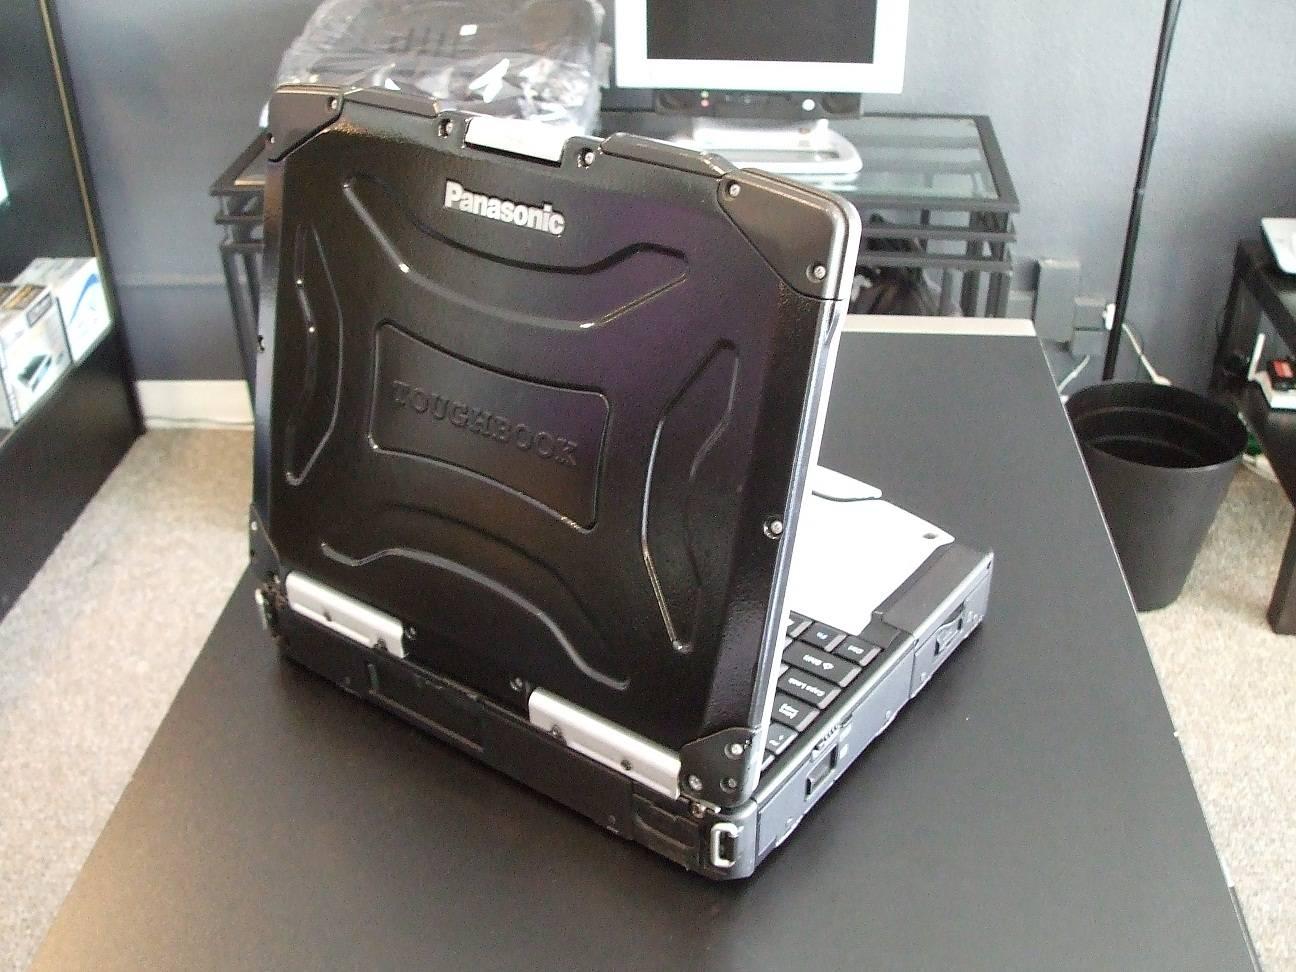 Panasonic CF29 Toughbook CUSTOMIZED